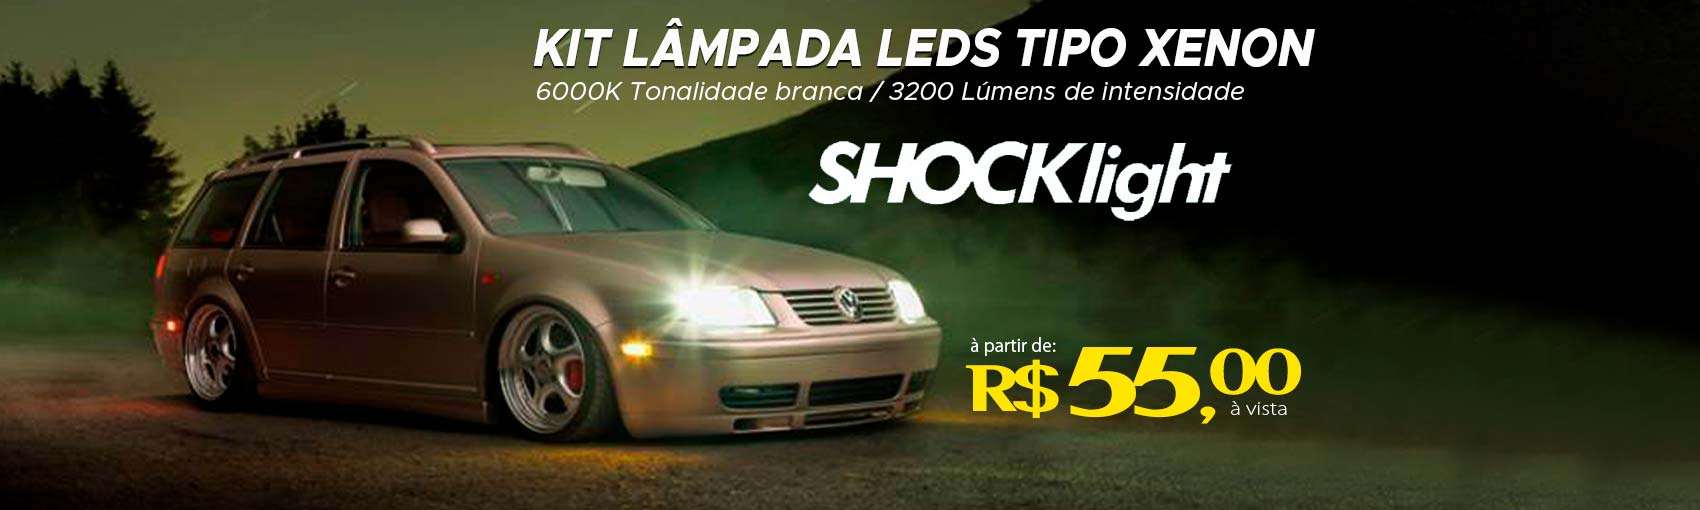 Kit Lâmpadas de leds Headlight Shocklight